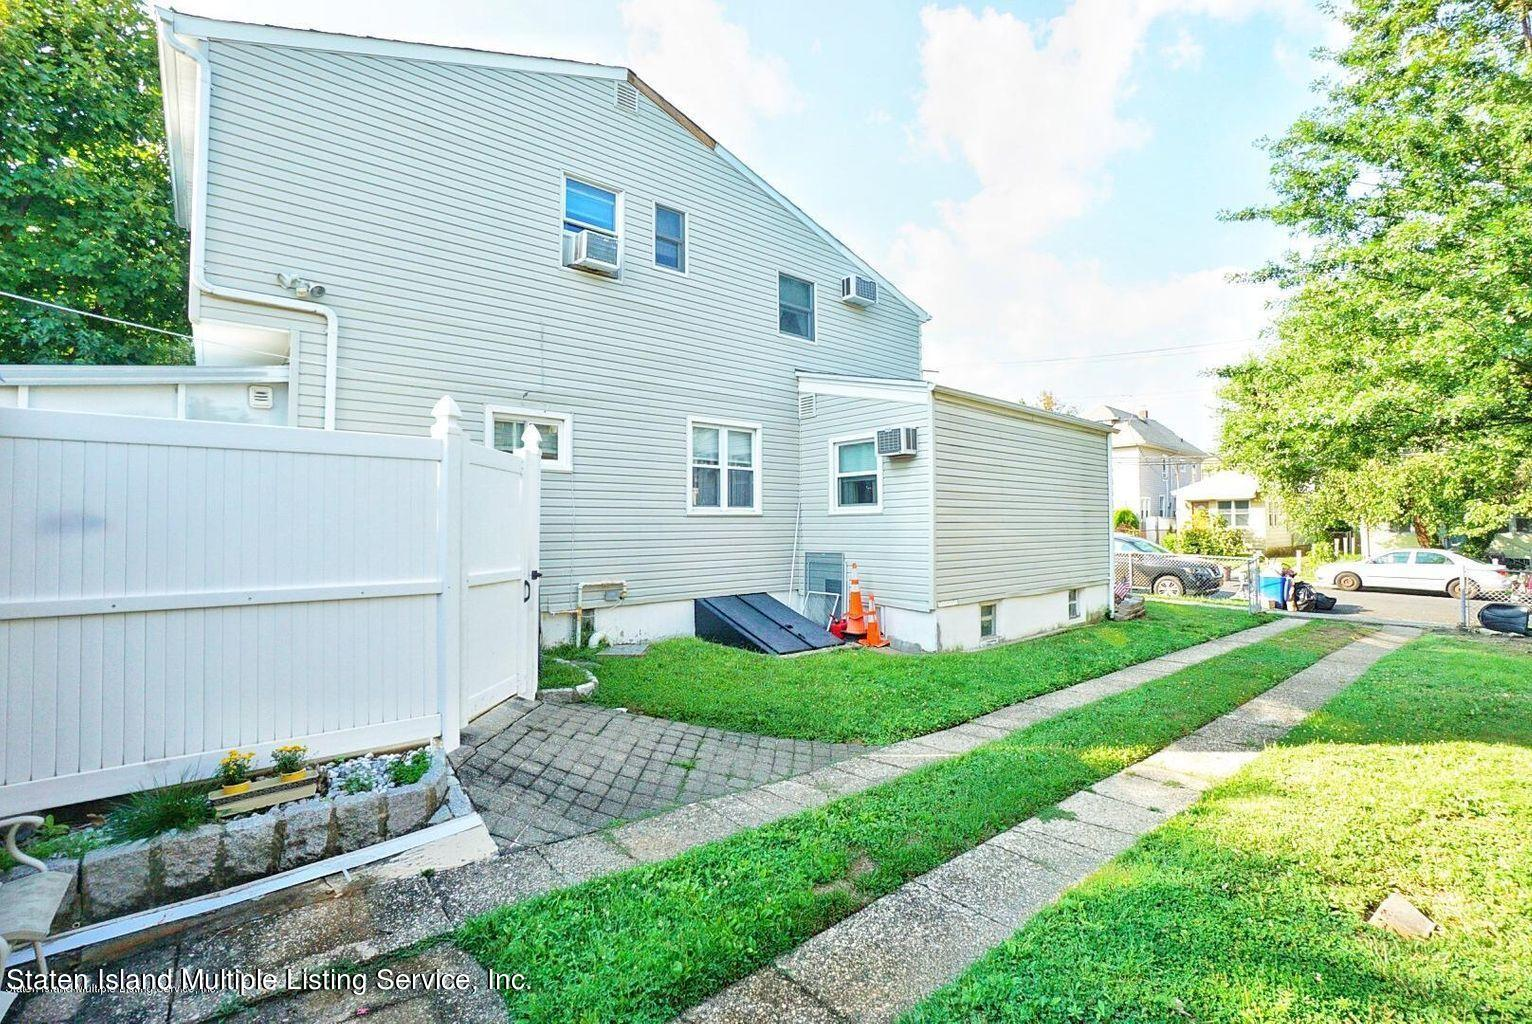 Single Family - Detached 174 Wiman Avenue  Staten Island, NY 10308, MLS-1145983-3